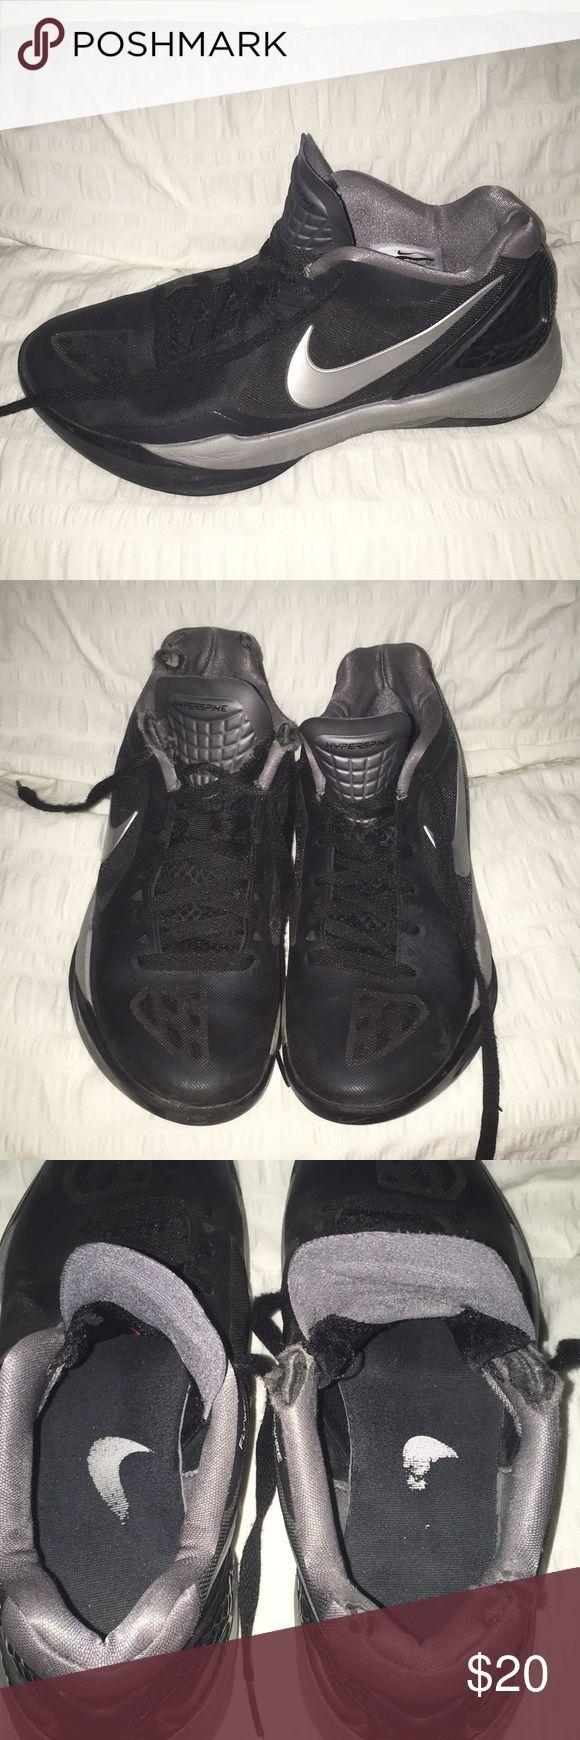 Nike Volleyball Schuhe Nike Hyperspike Zoom Court Schuhe Schwarz W Grau Silb Fashionaccessories Fashioninfluencer Ootdfashion F Nike Volleyball Shoes Volleyball Shoes Nike Volleyball